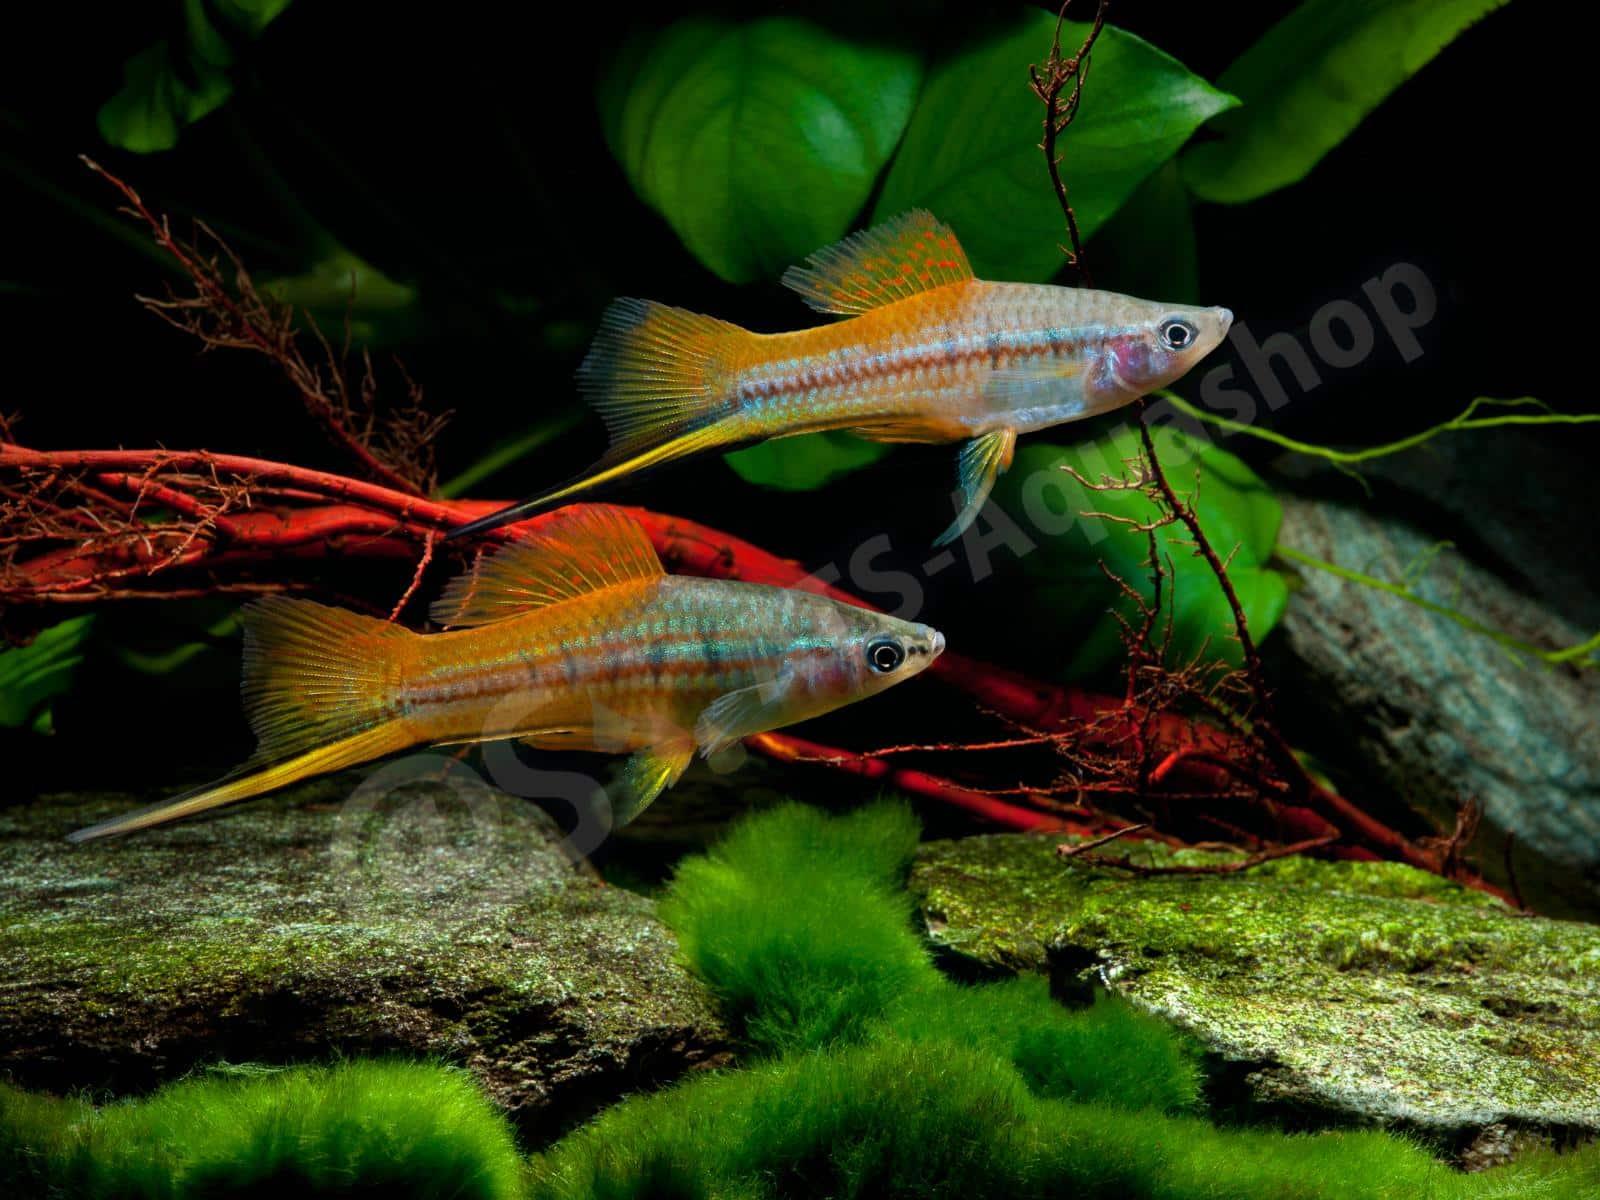 xiphophorus hellerii enrico richter 0299 8